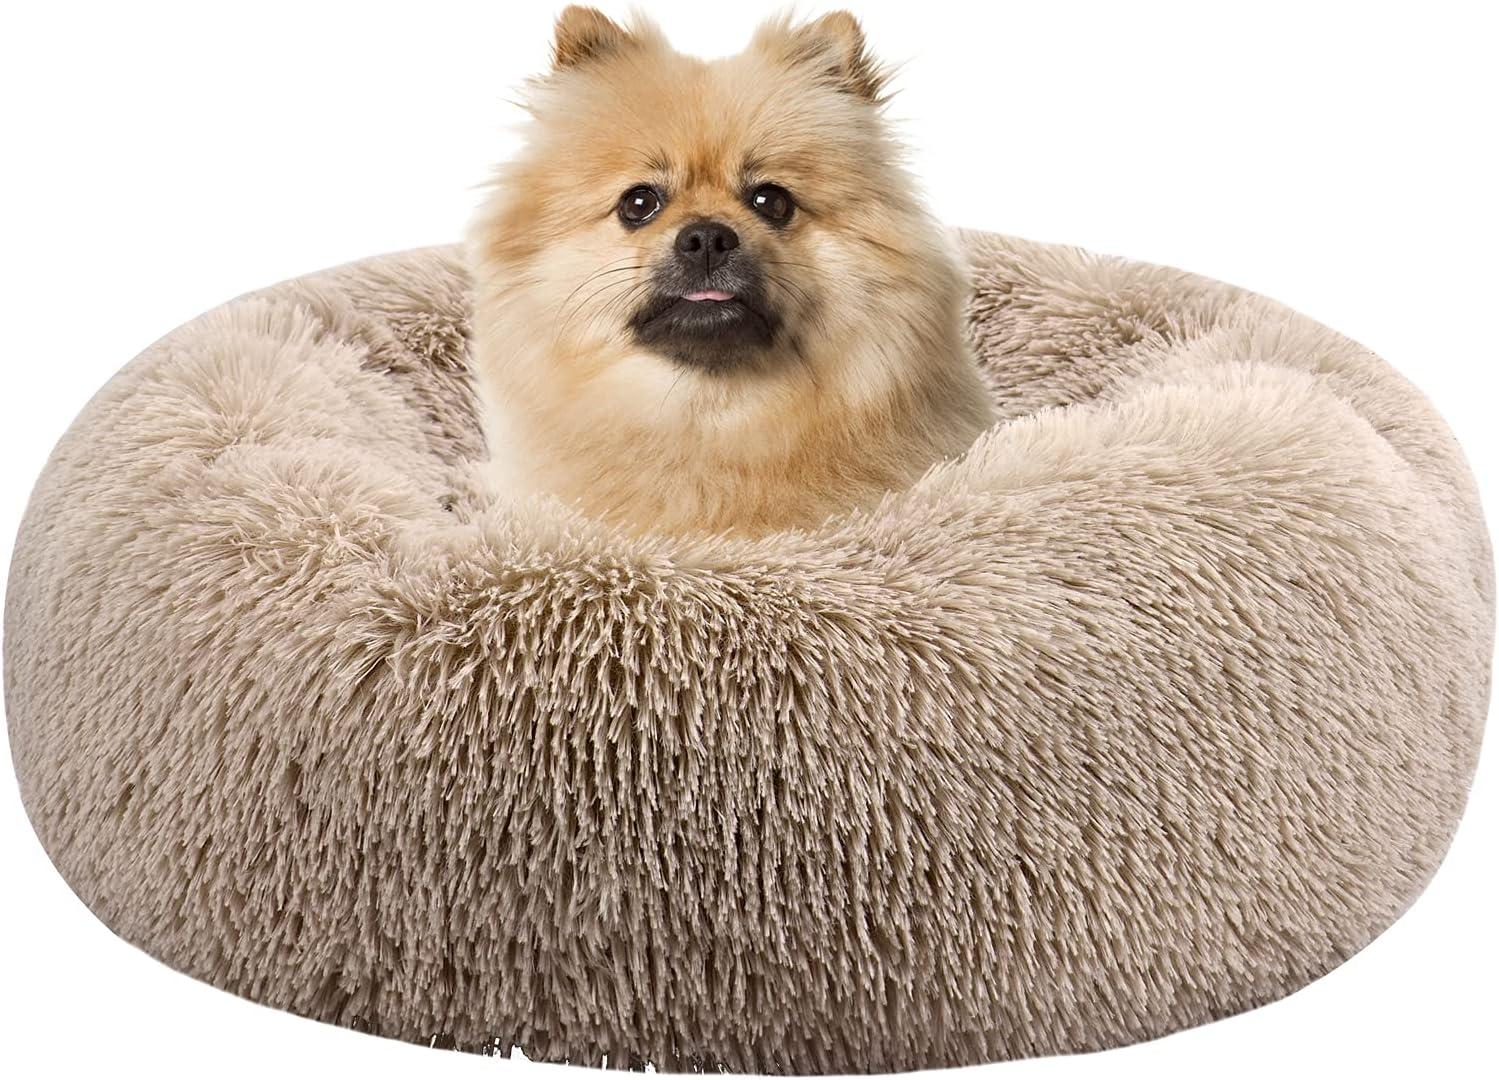 Sayiant Cama para Mascotas Cama para Gatos Suave, cálida, mullida, Felpa, Donut, Cama, Relajante, Lavable, Cama para Dormir (Marrón)